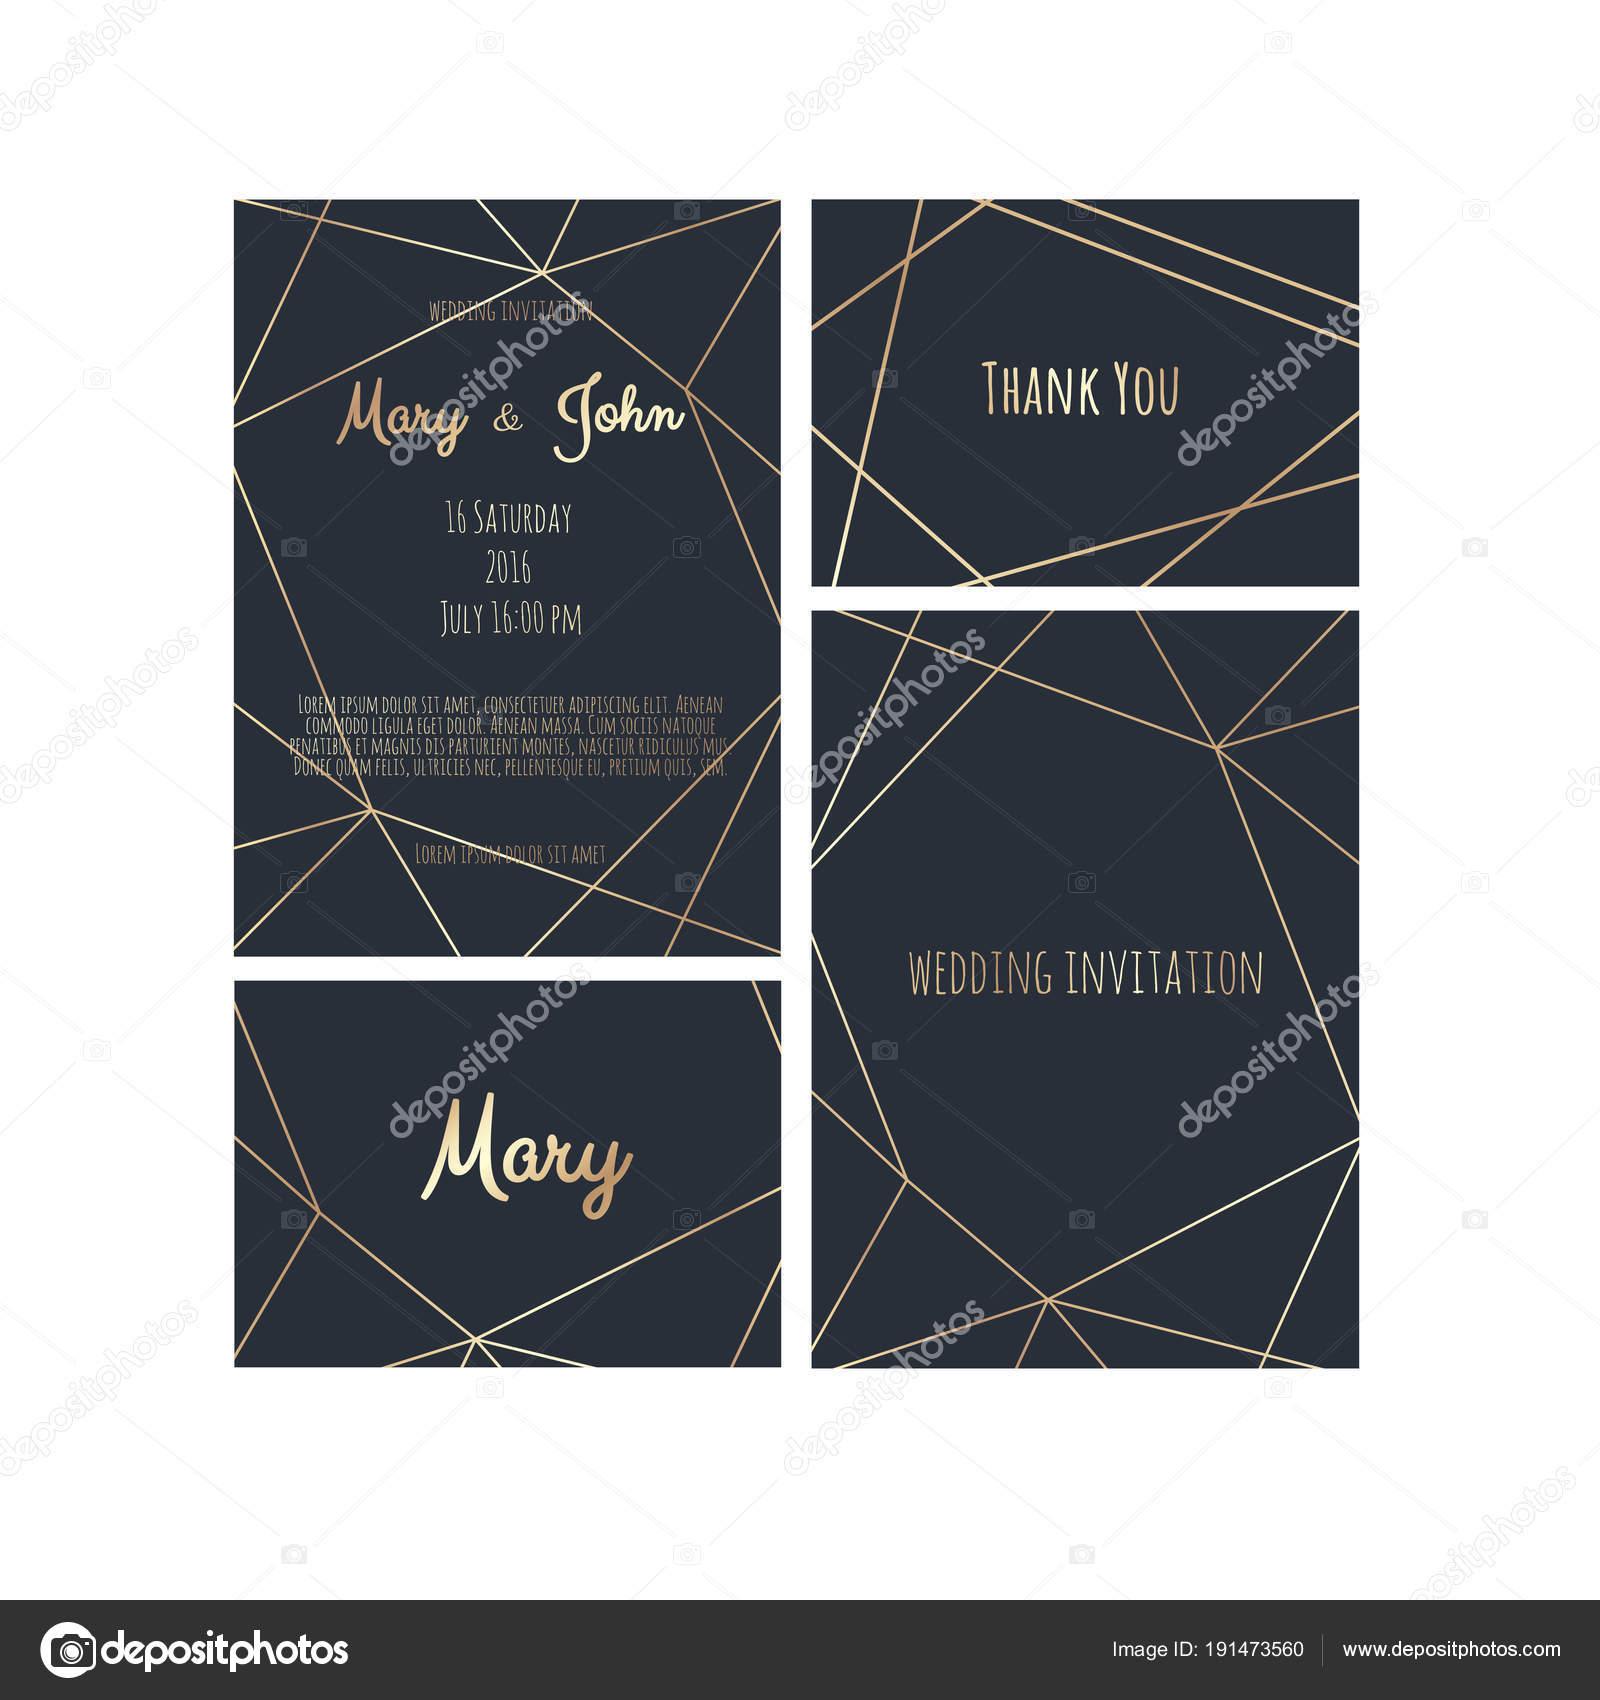 Wedding invitation invite card design with geometrical art lines wedding invitation invite card design with geometrical art lines gold foil border frame stopboris Gallery